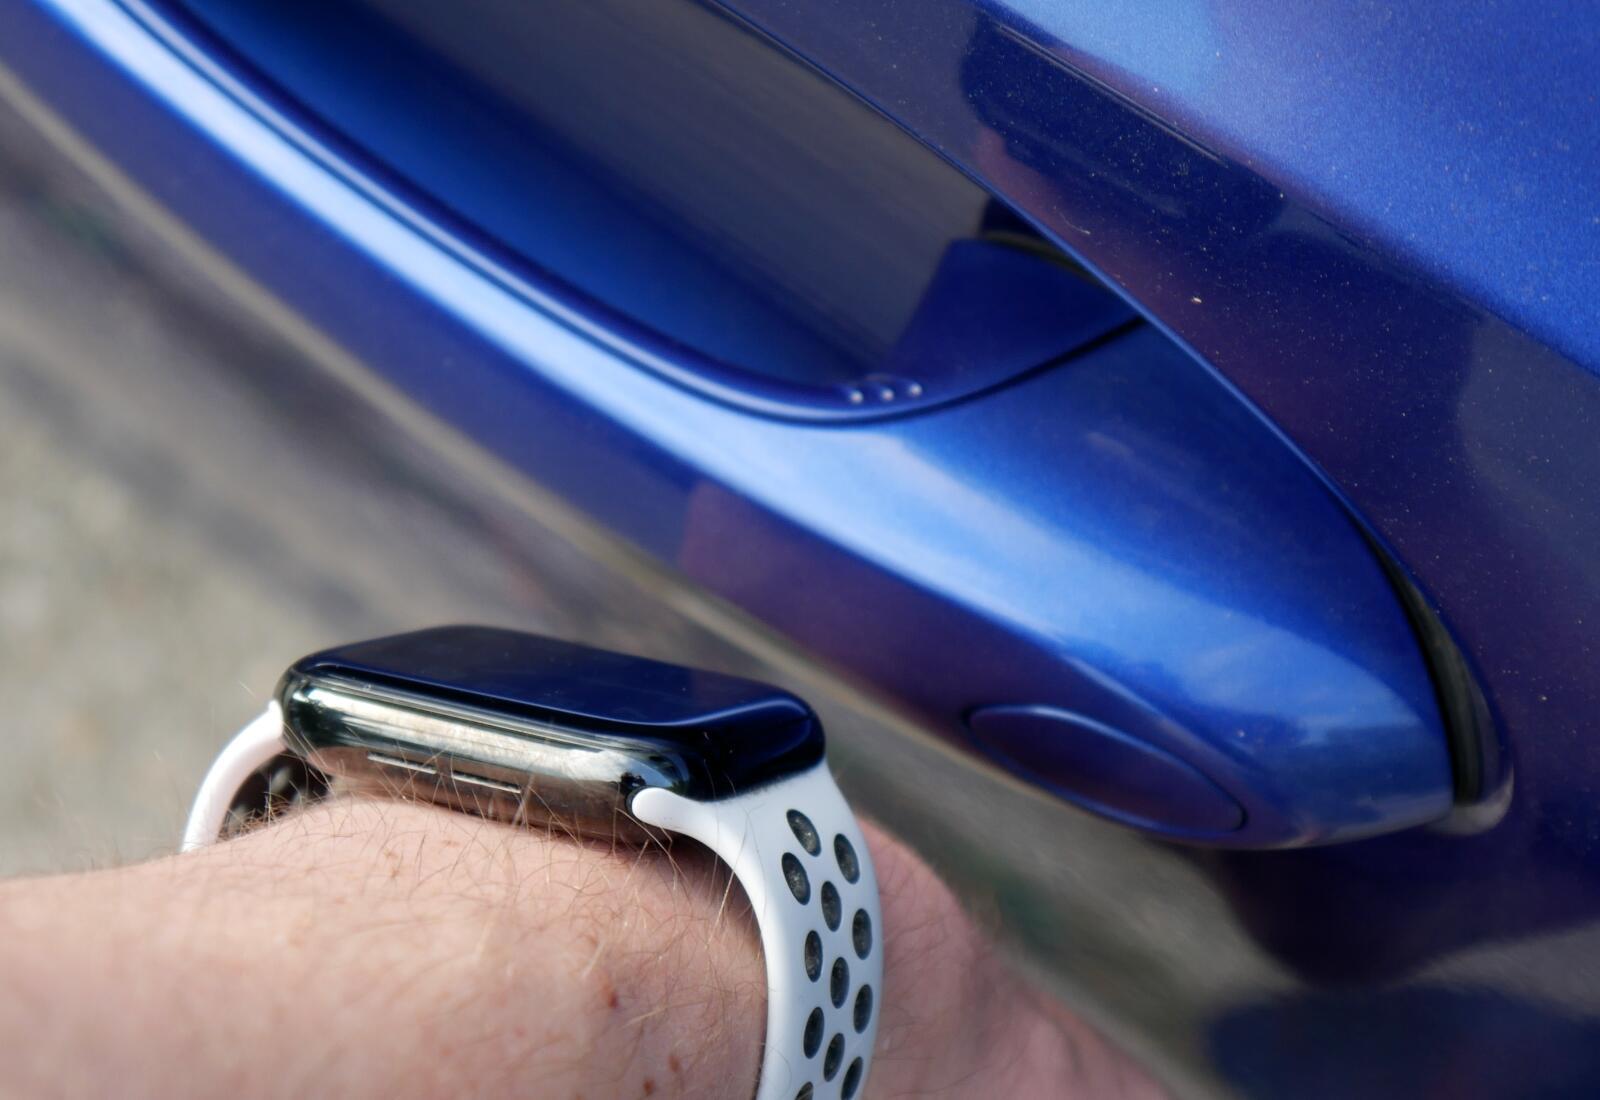 Apple Carkey Bmw Digital Key Watch Door